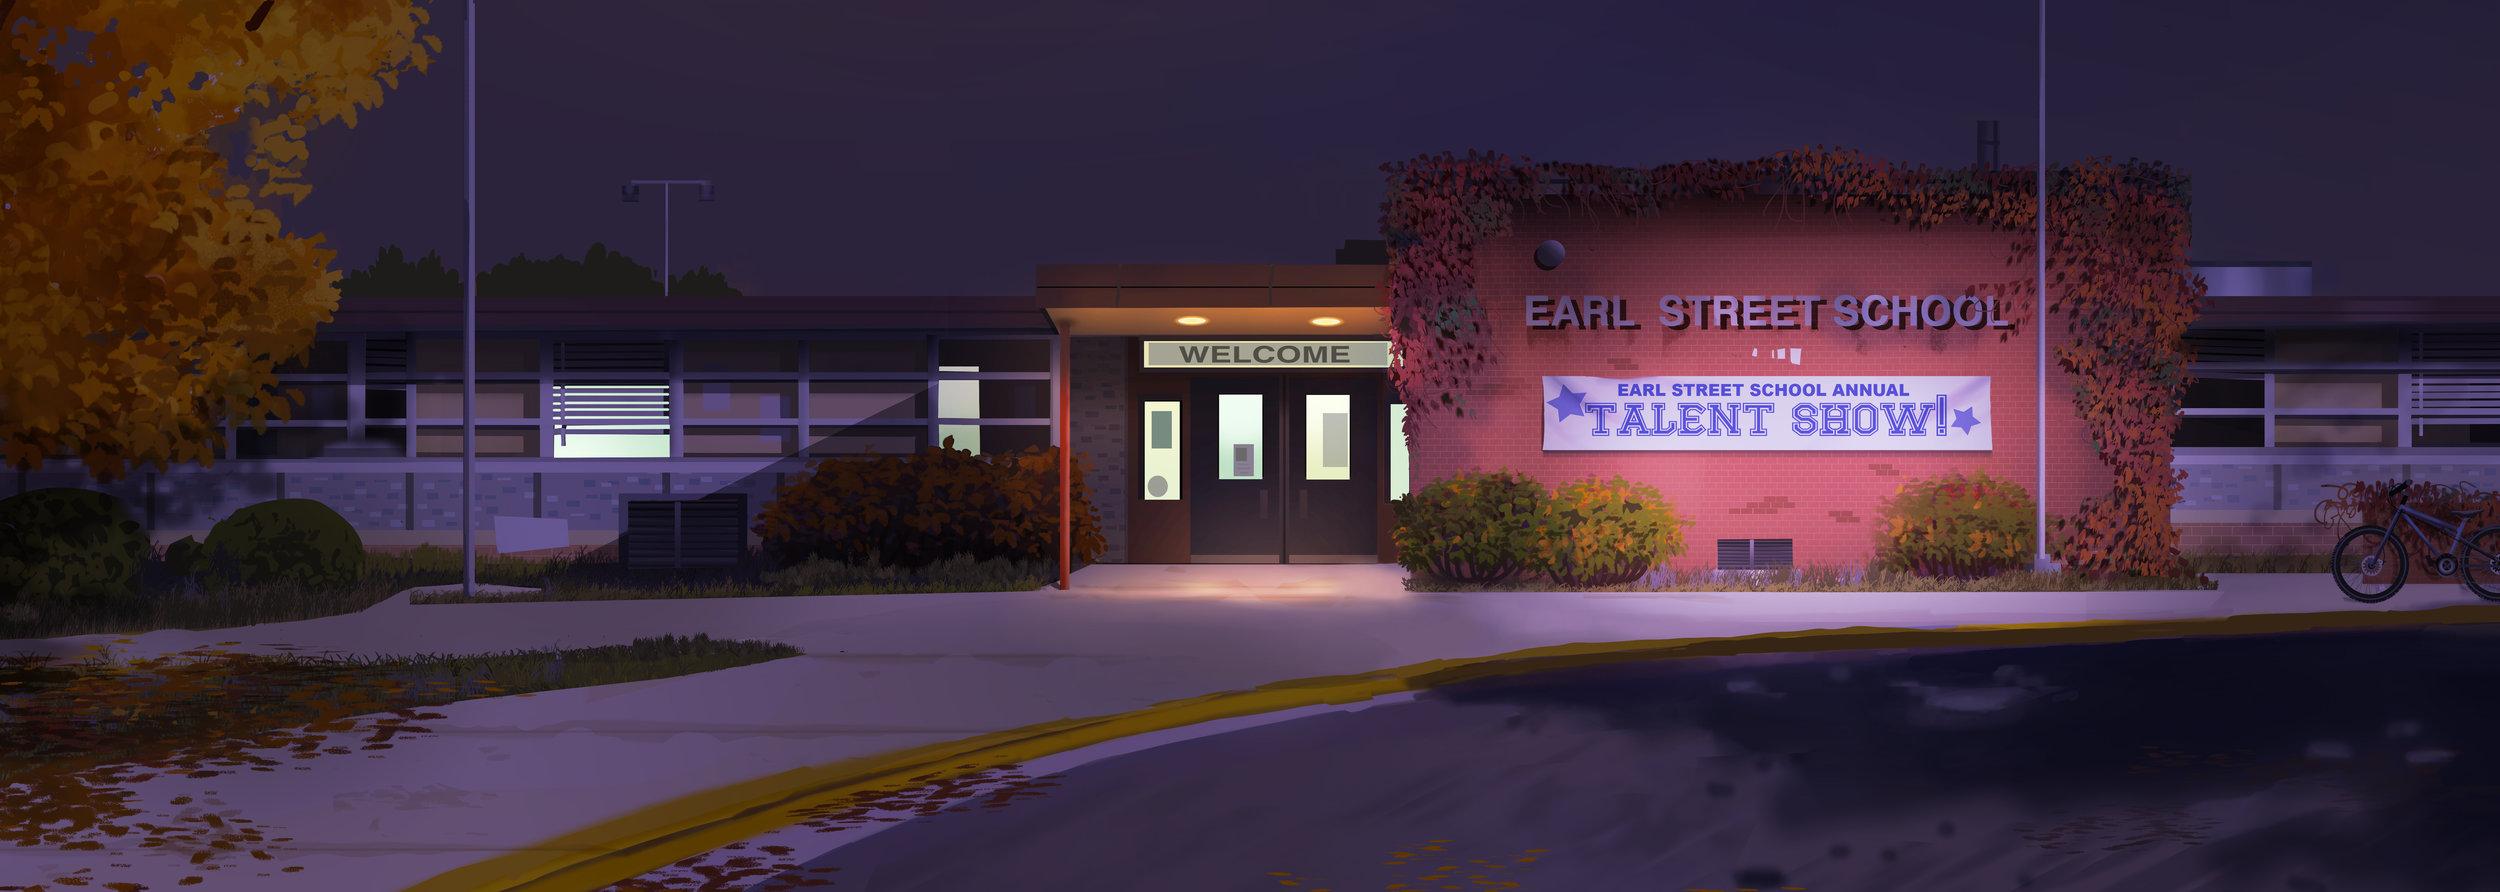 Night School flat latest version(less sky).jpg